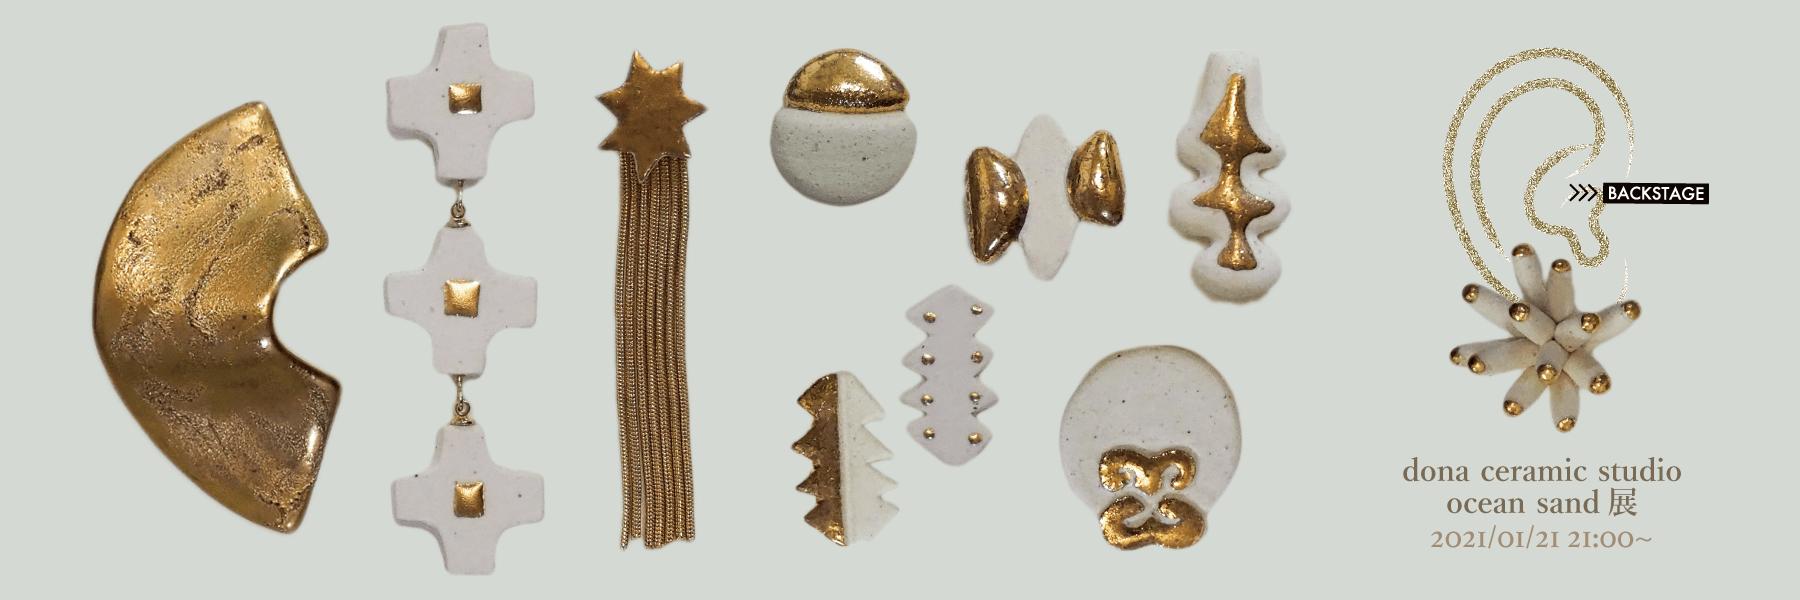 【dona ceramic studio】ocean sand展